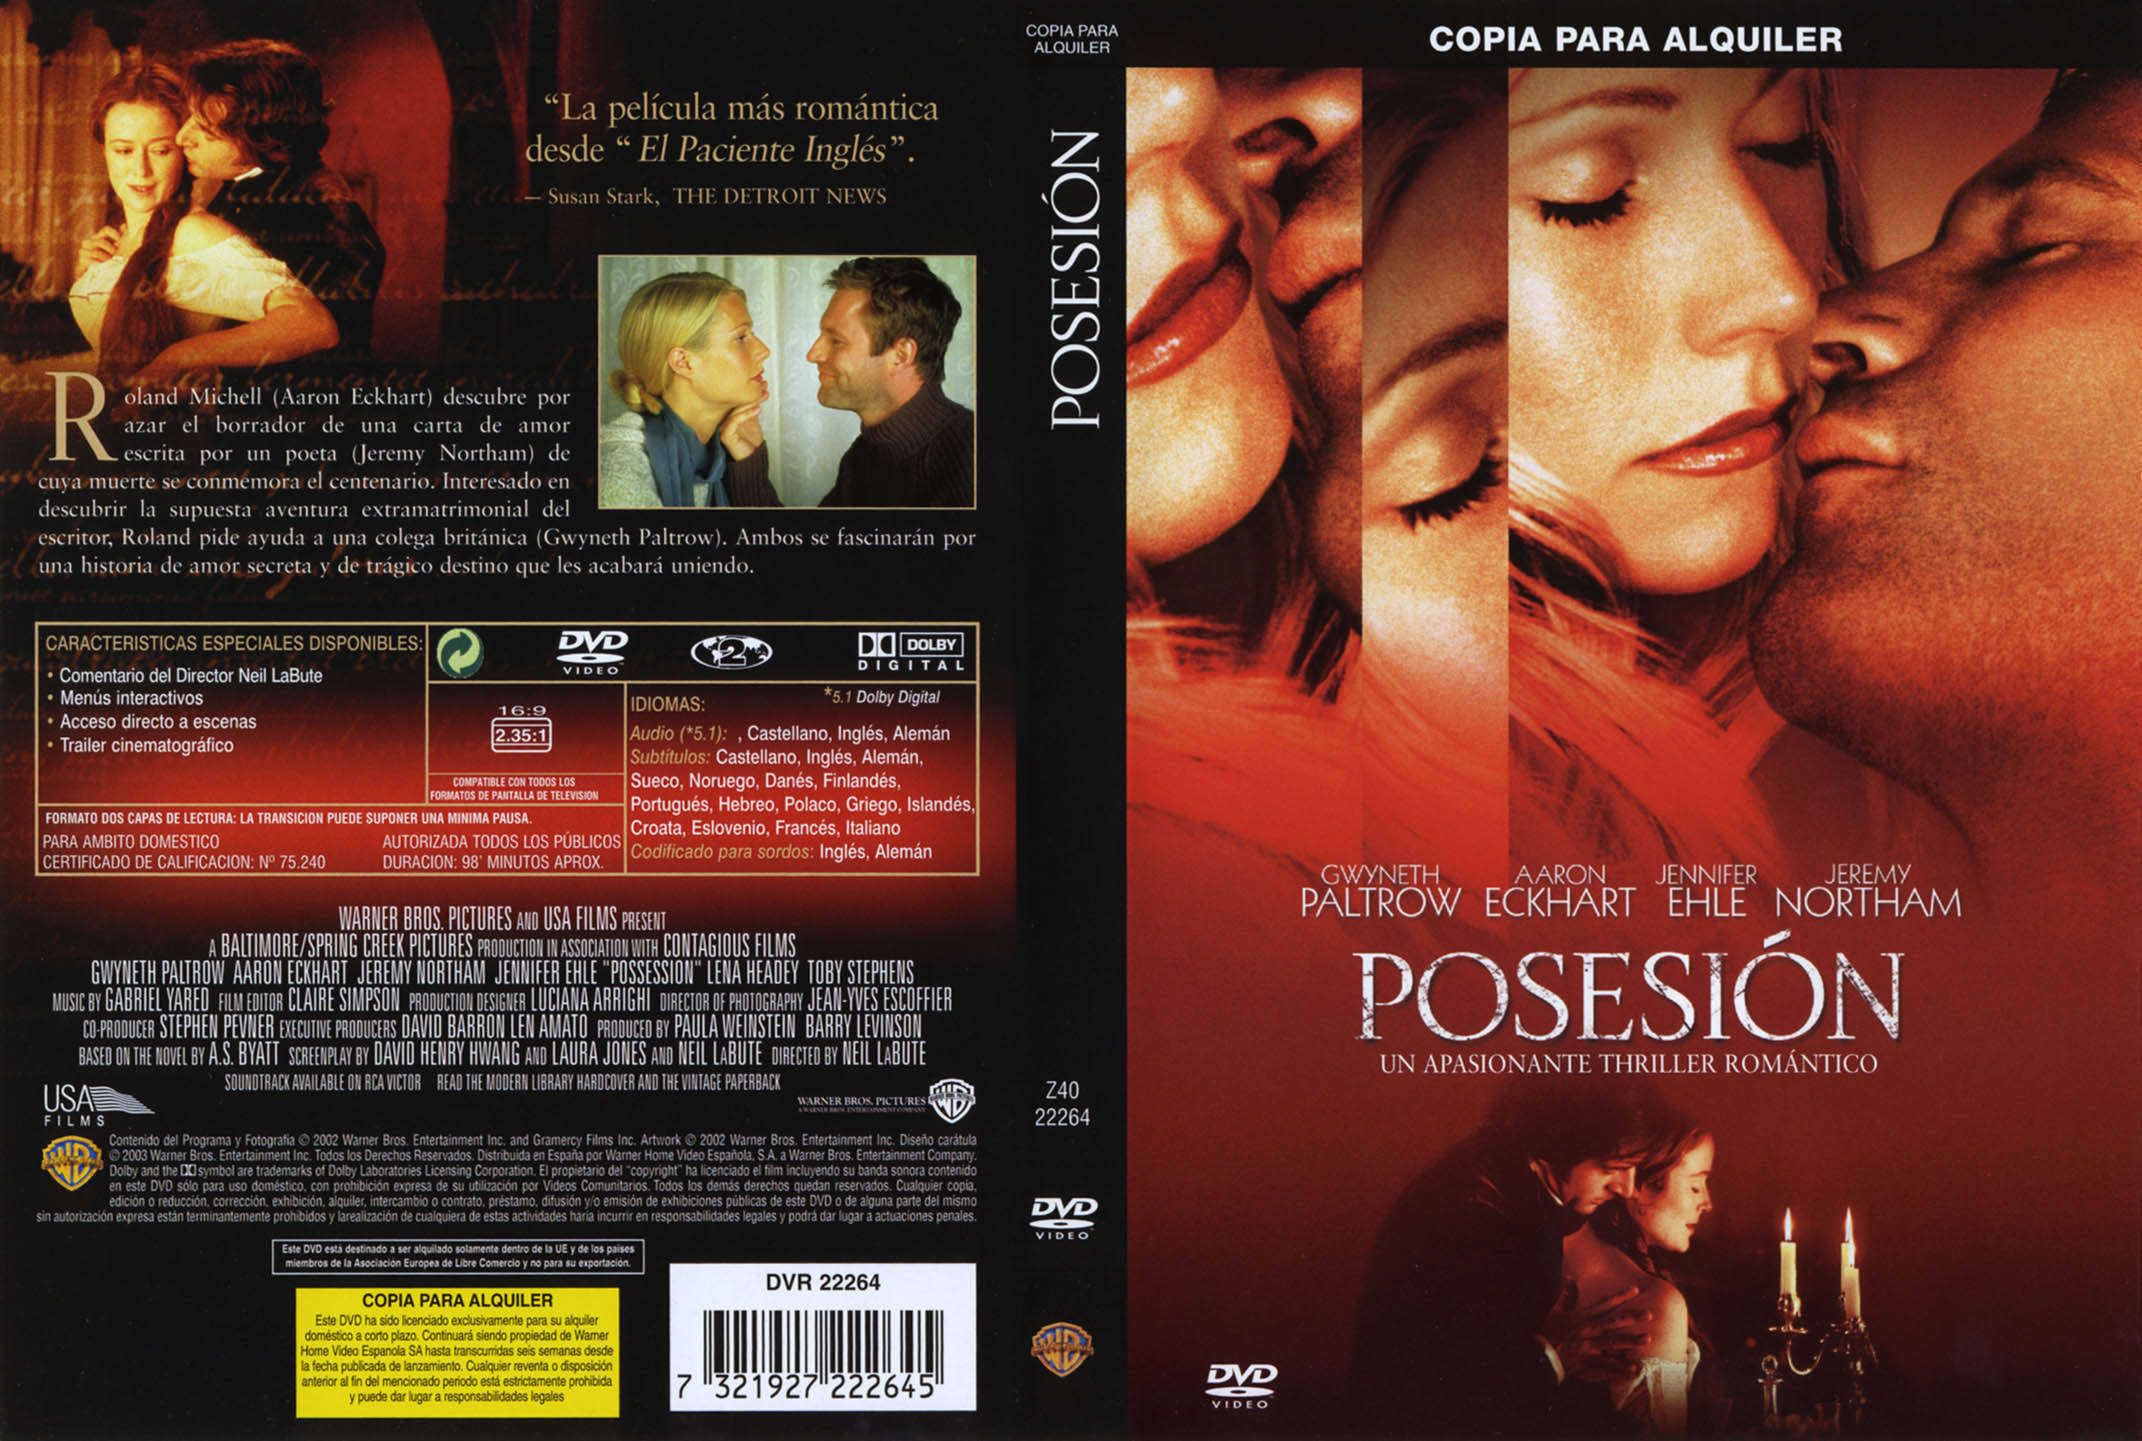 Posesión [MG][2002]